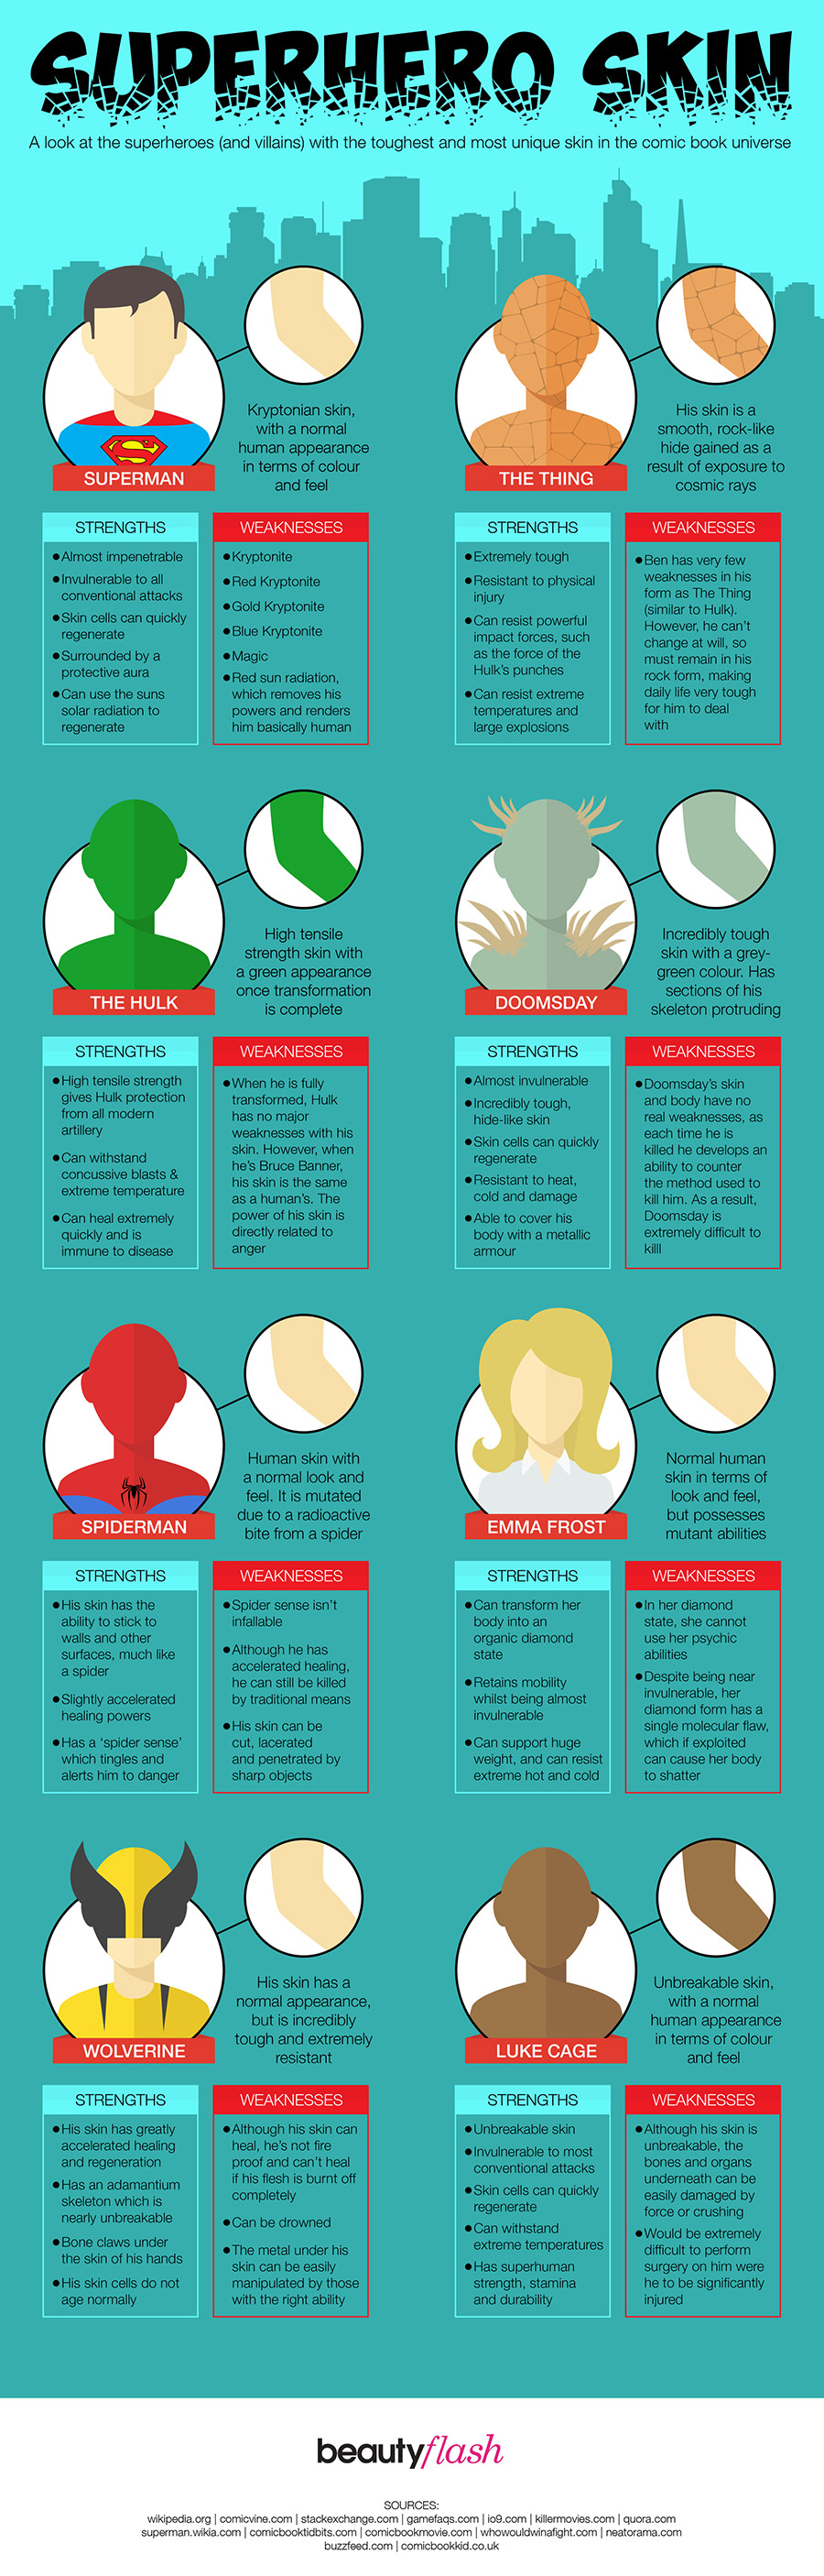 superhero-skin-infographic-breakdown